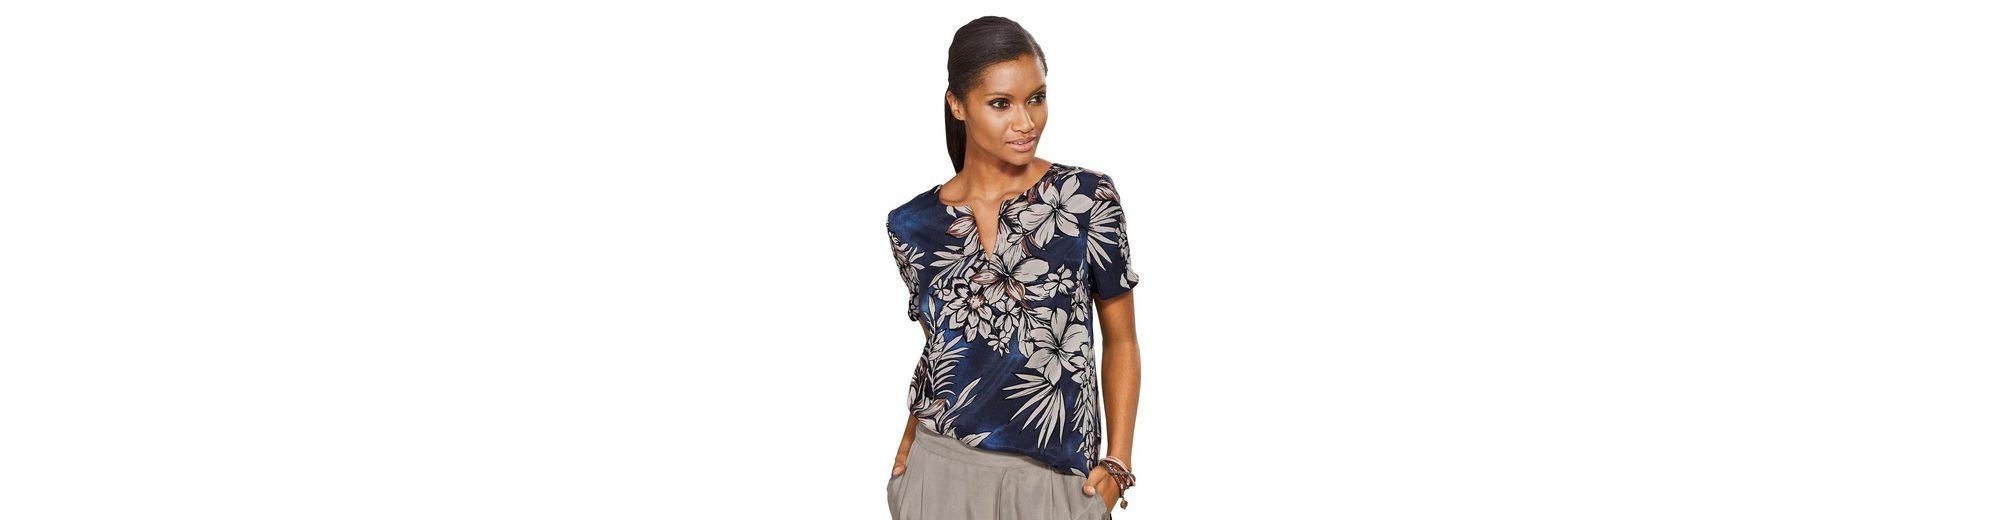 Alba Moda Tunikabluse mit floralem Print Outlet Günstig Online Rabatt Top-Qualität e3tolB